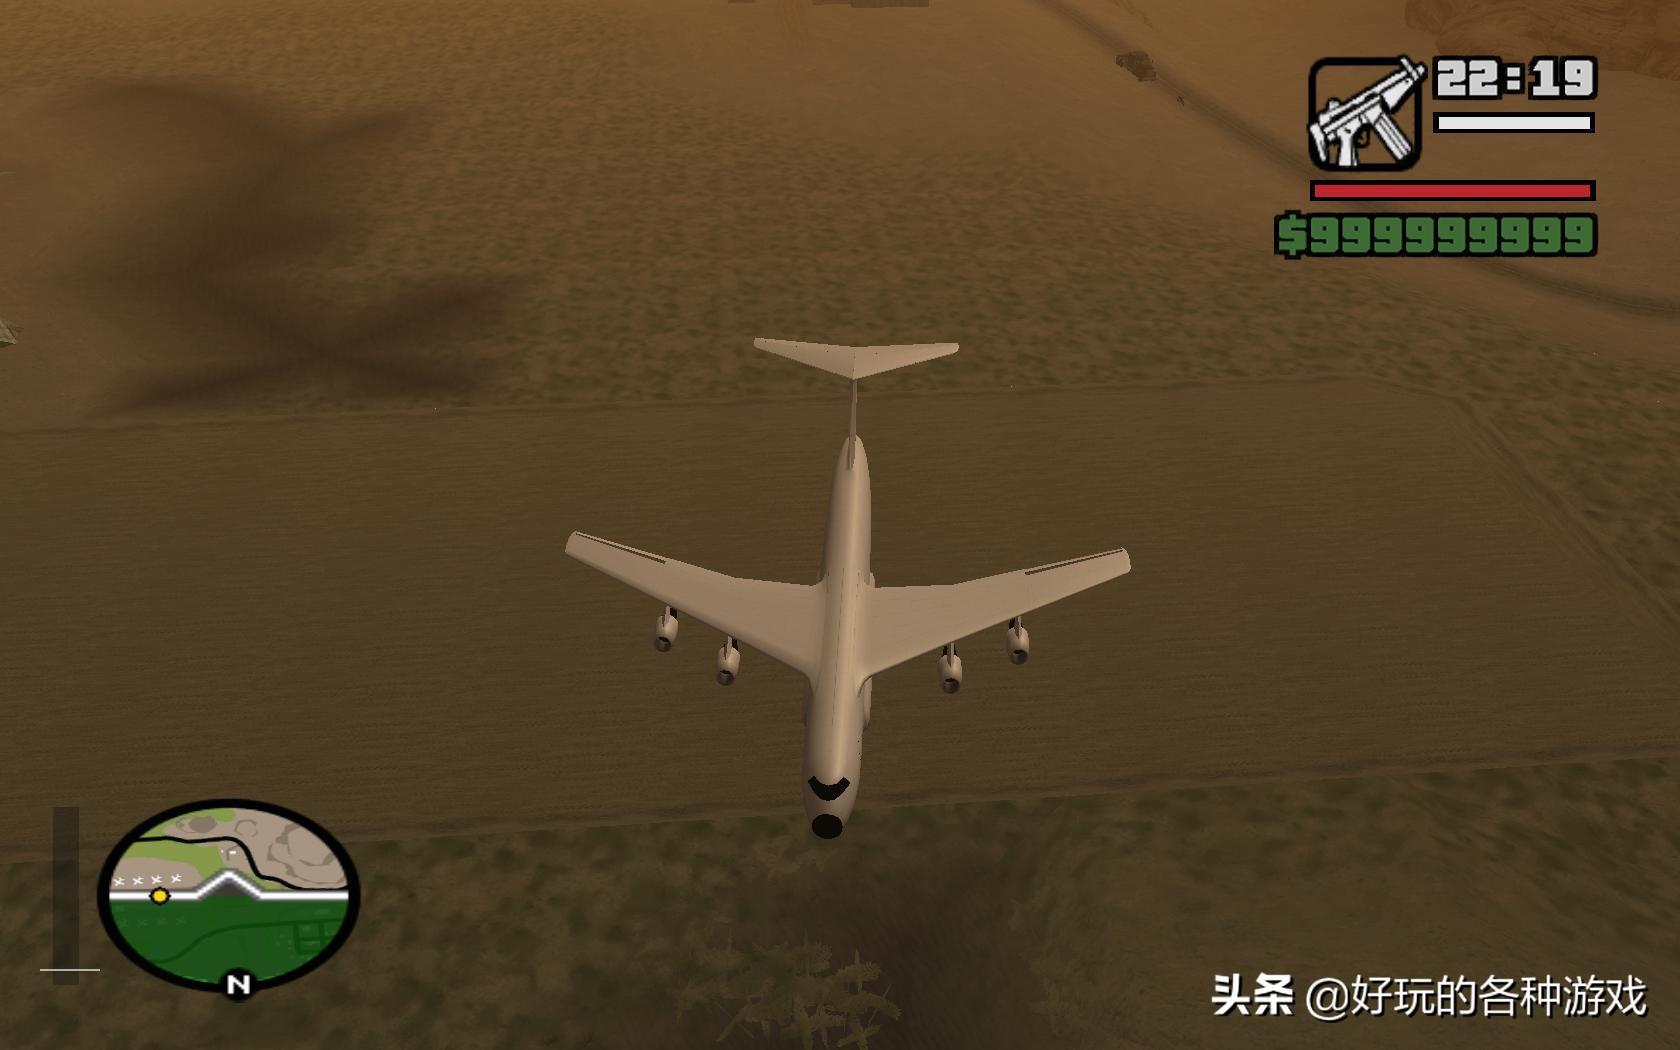 GTA圣安地列斯飞机大全,天空不过是触手可及的星辰